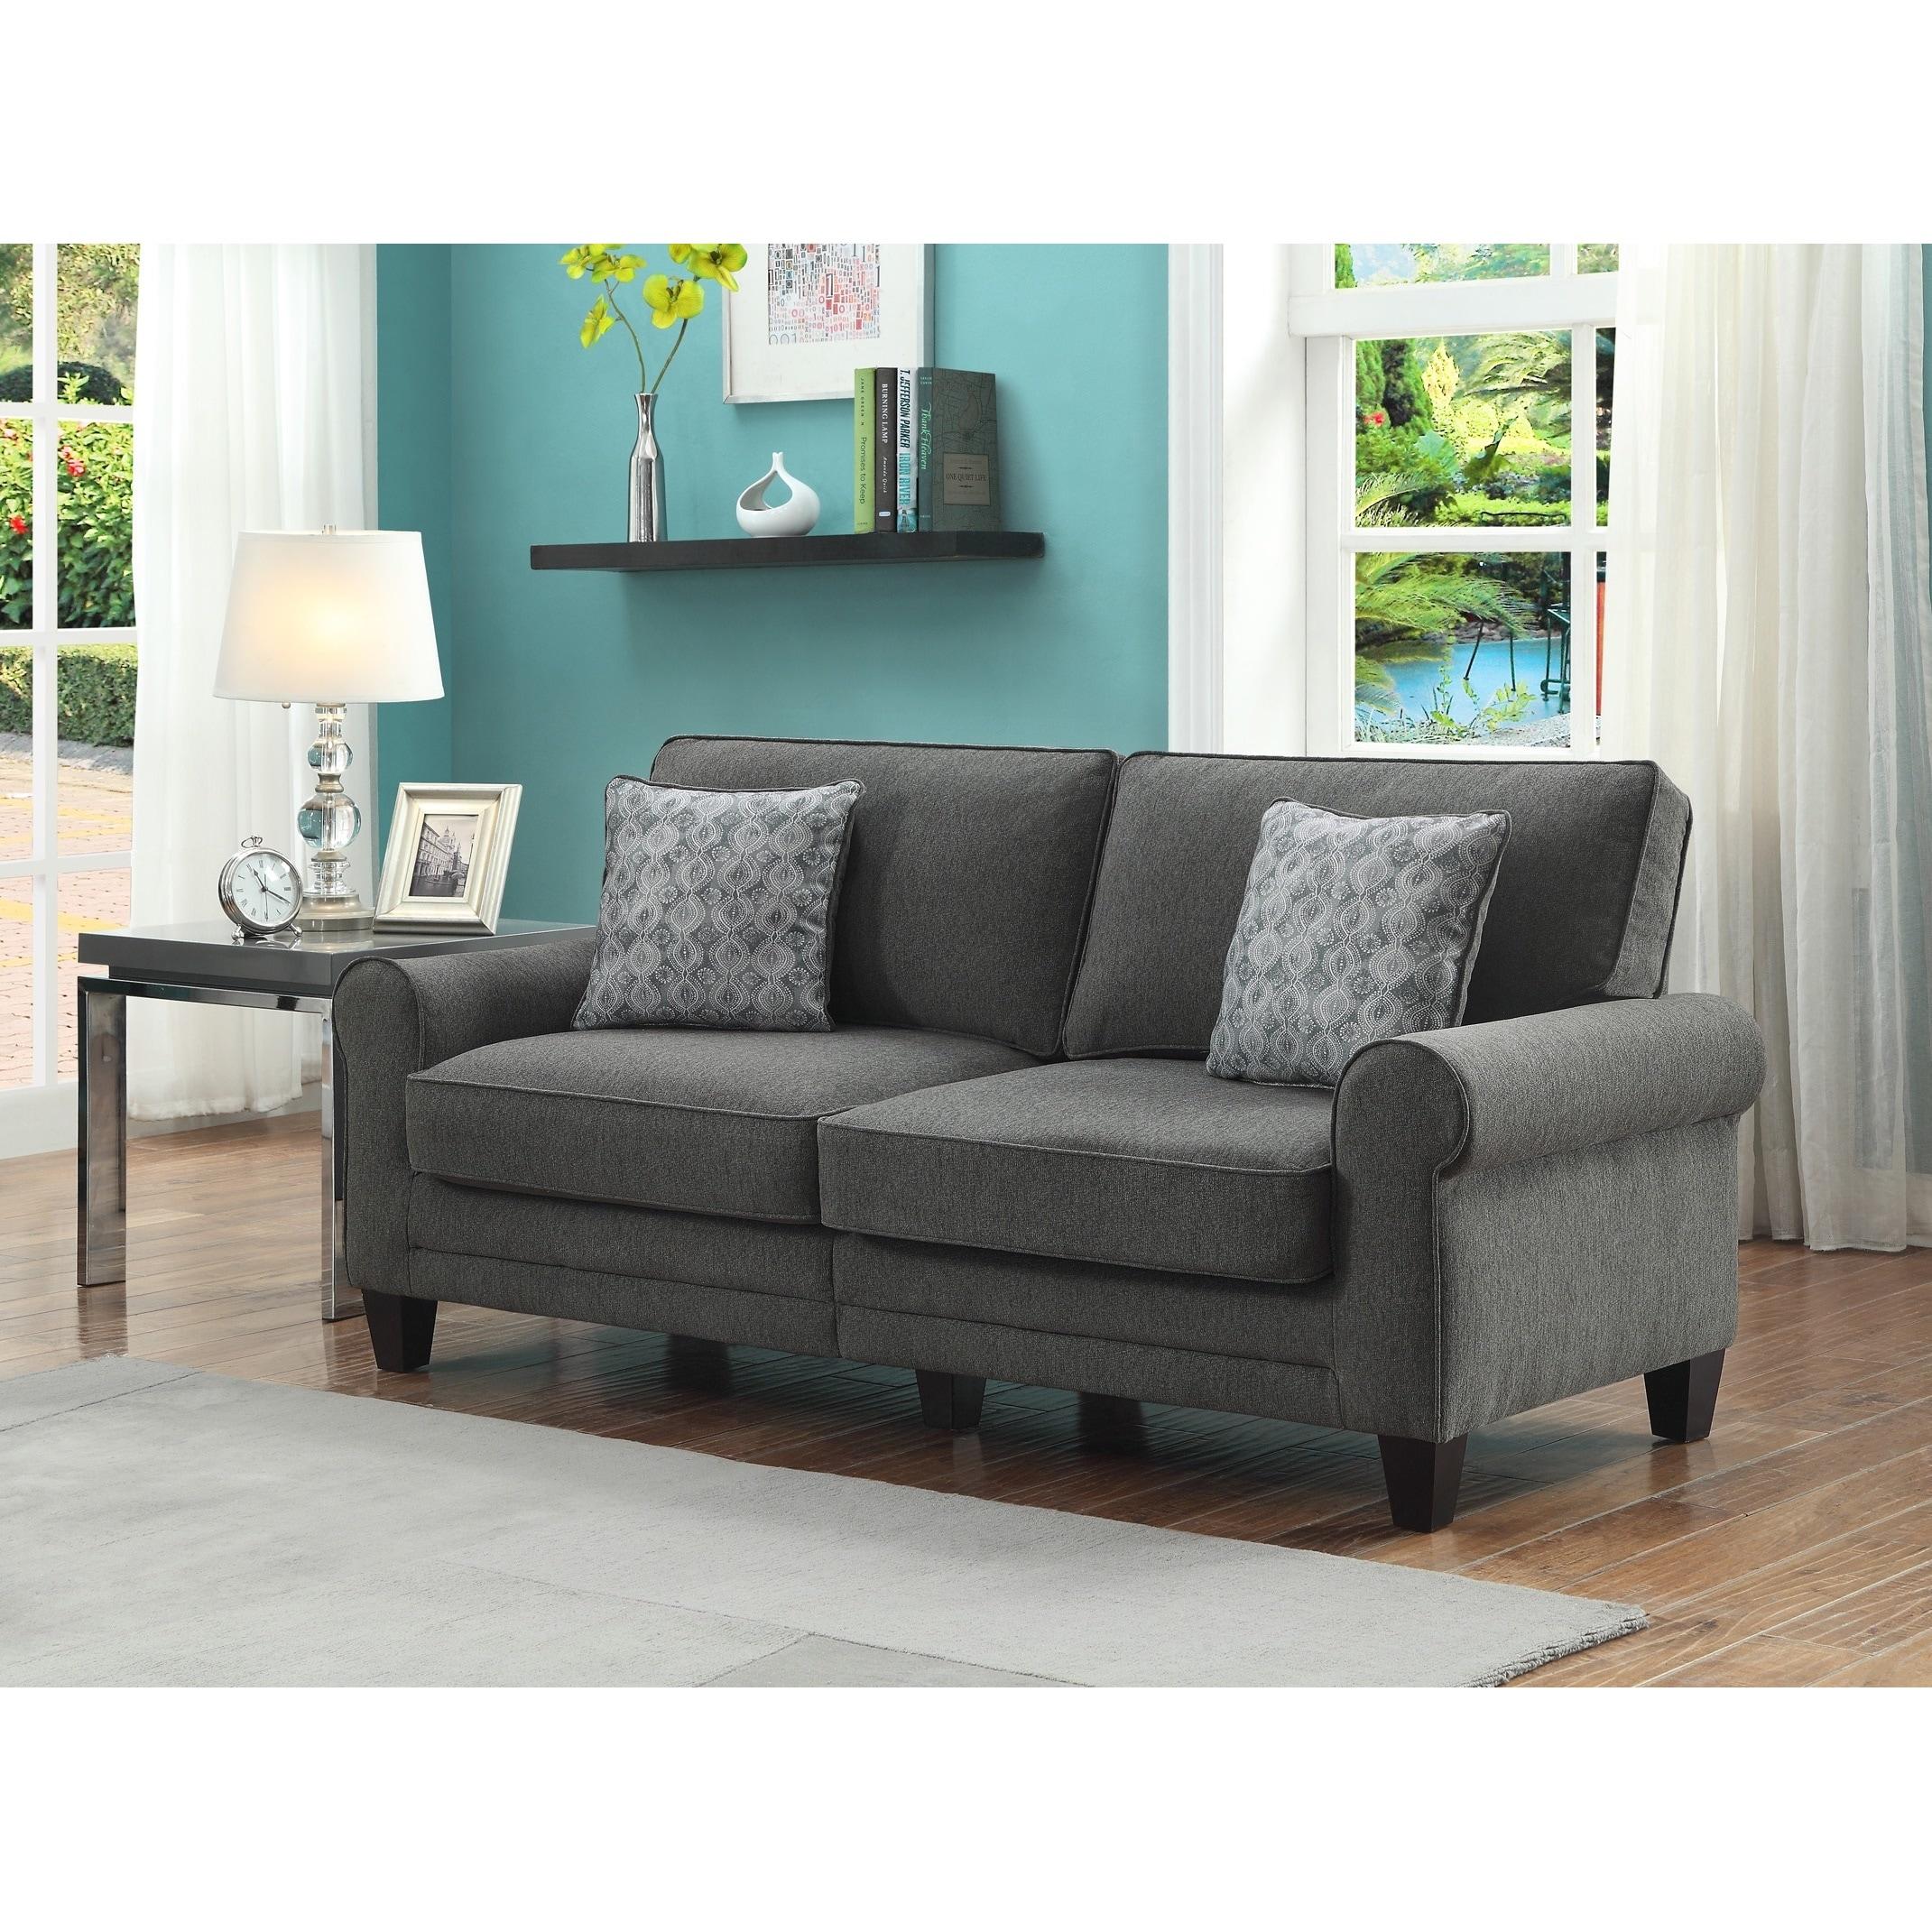 Serta RTA Somerset Collection Vivendo Grey 73-inch Sofa - Free ...